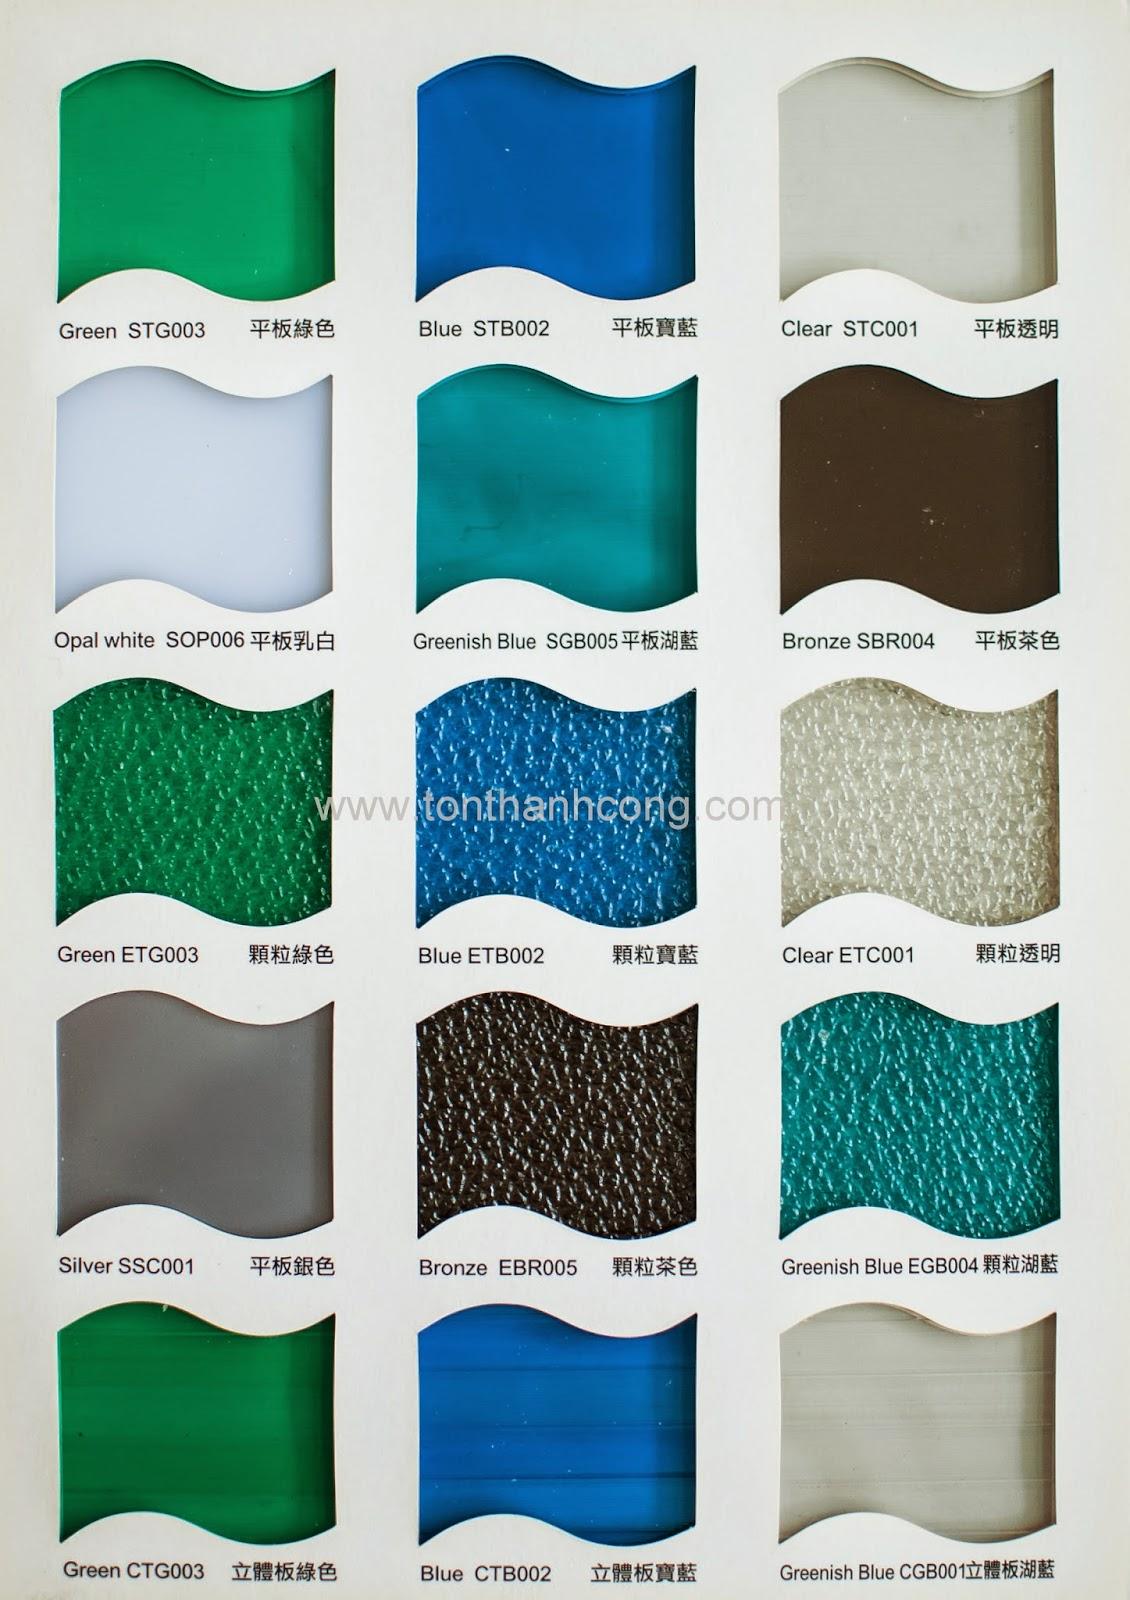 Catalogue Tấm Lấy Sáng Polycarbonate Đặc Ruột Tileron- Trang 2